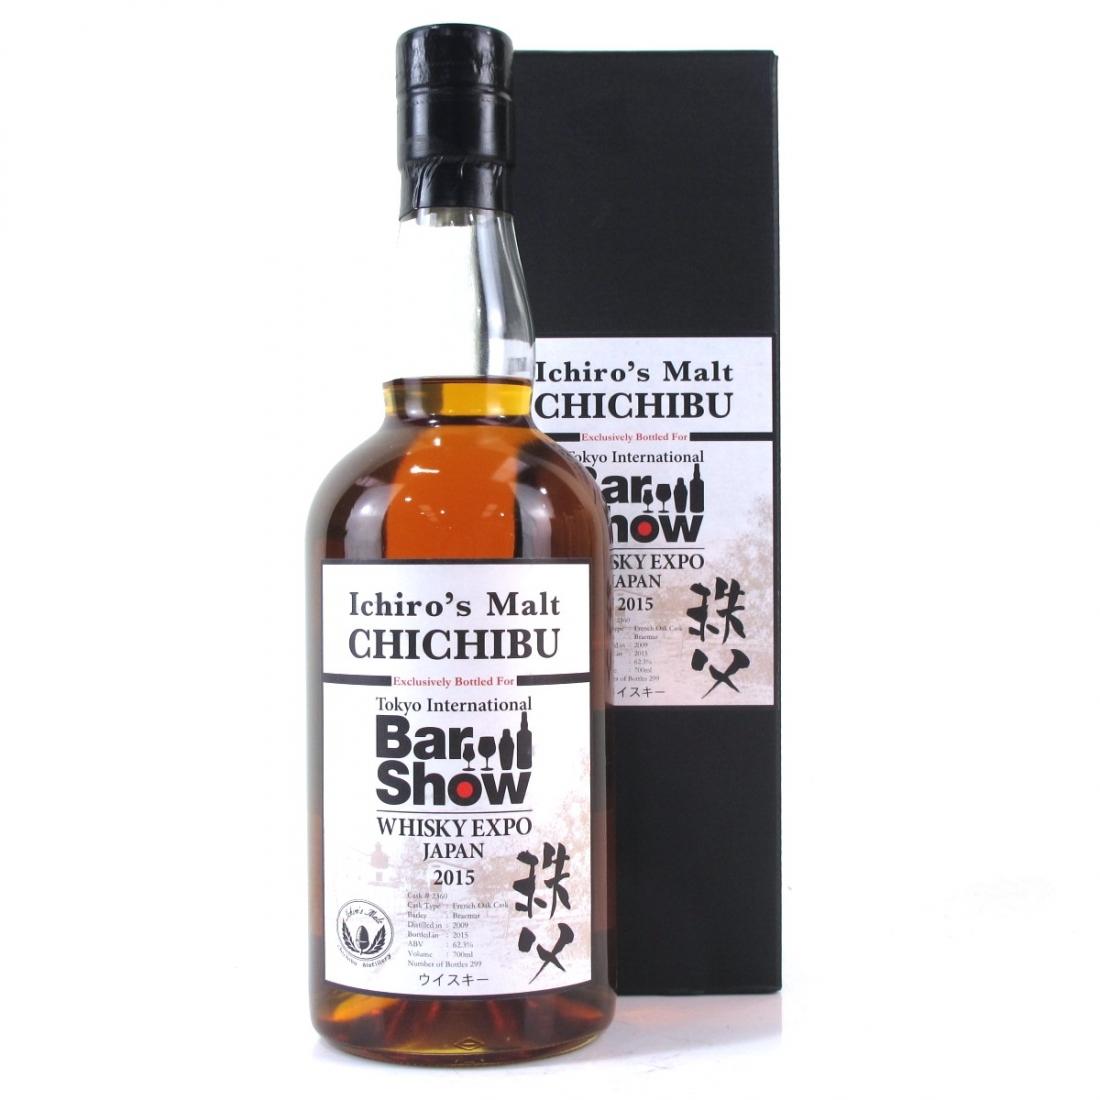 Chichibu 2009 Ichiro's Malt Single Cask #2360 / Whisky Live Tokyo 2015